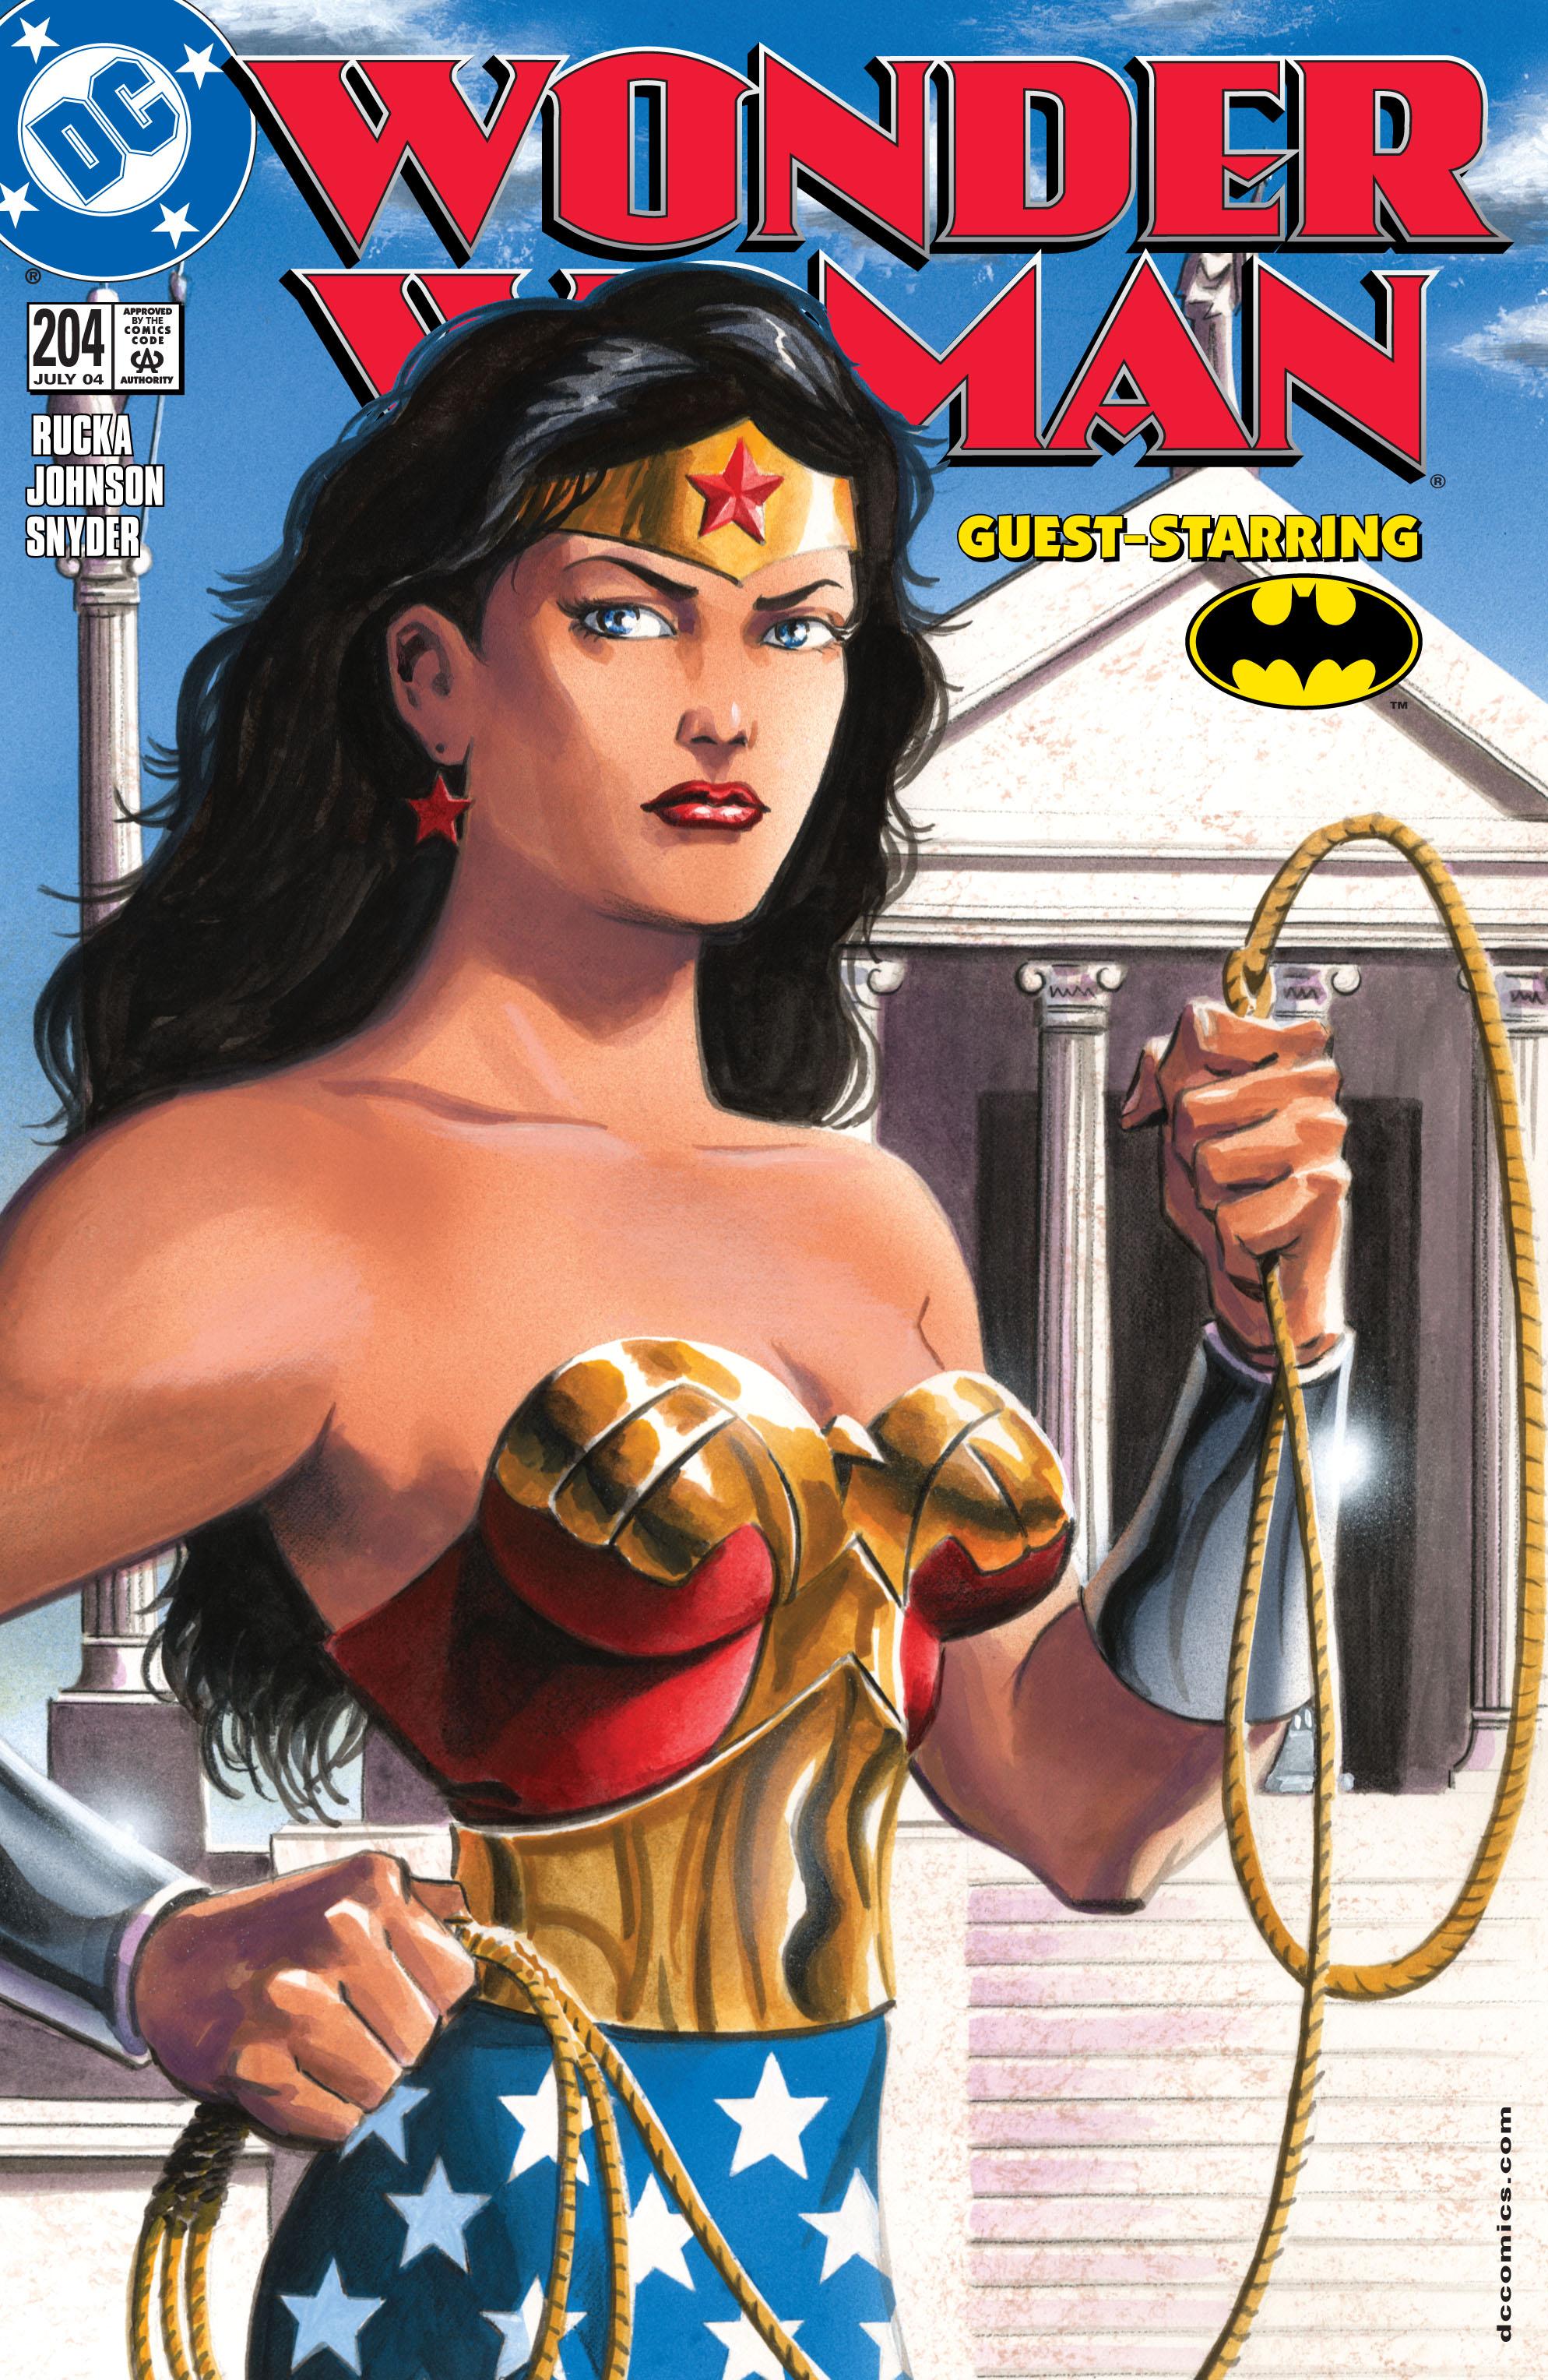 Read online Wonder Woman (1987) comic -  Issue #204 - 1